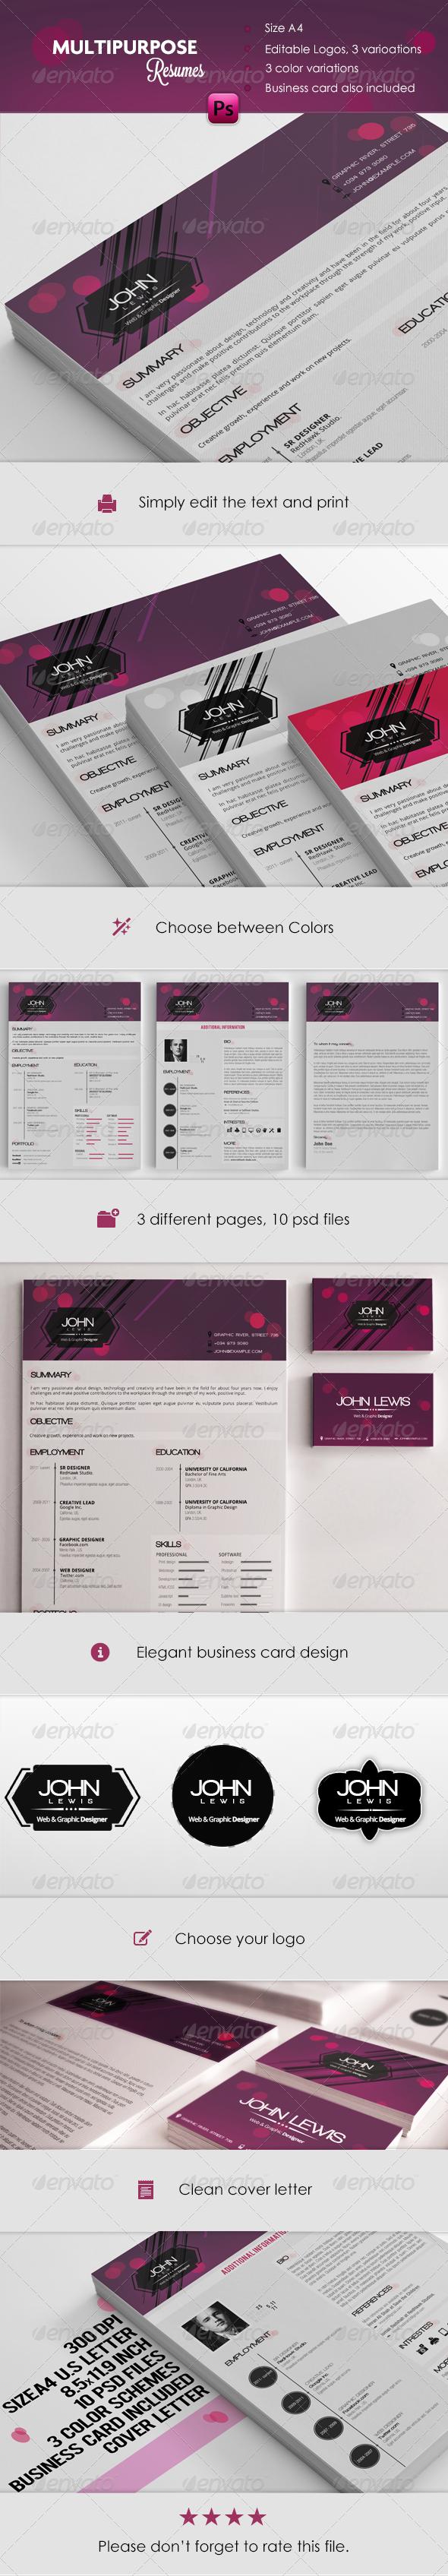 pin by bashooka web  u0026 graphic design on killer resume template  u0026 design